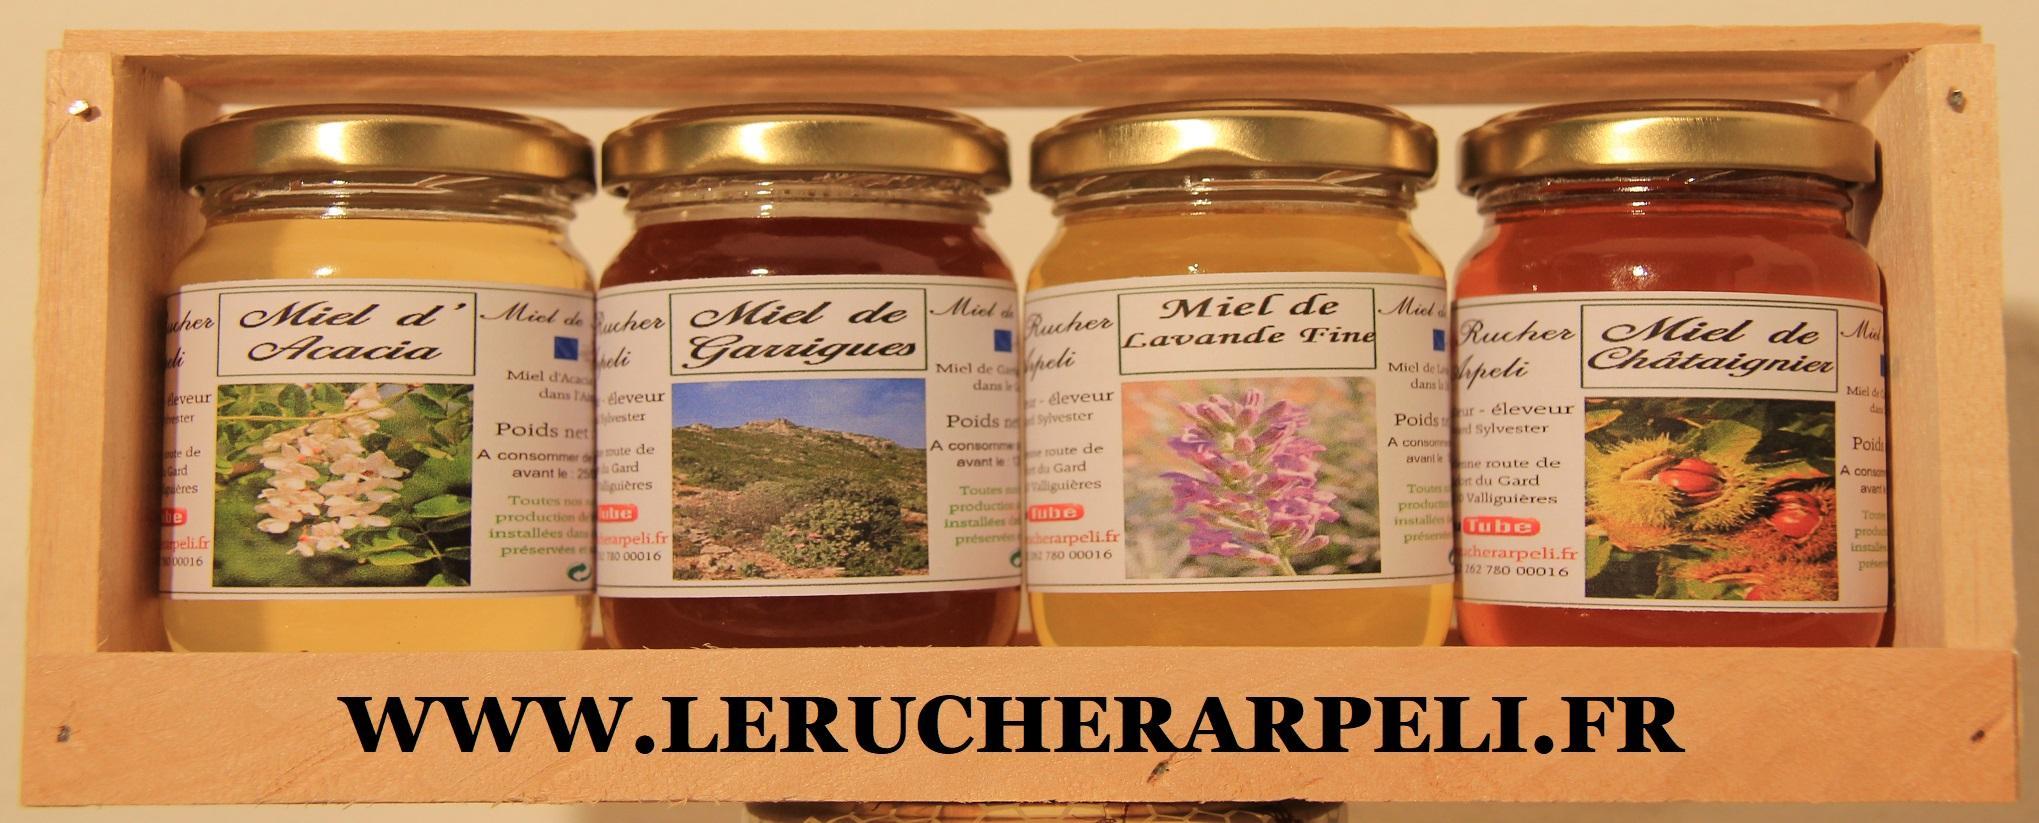 Coffret en bois de 4 pots de 125g de miel